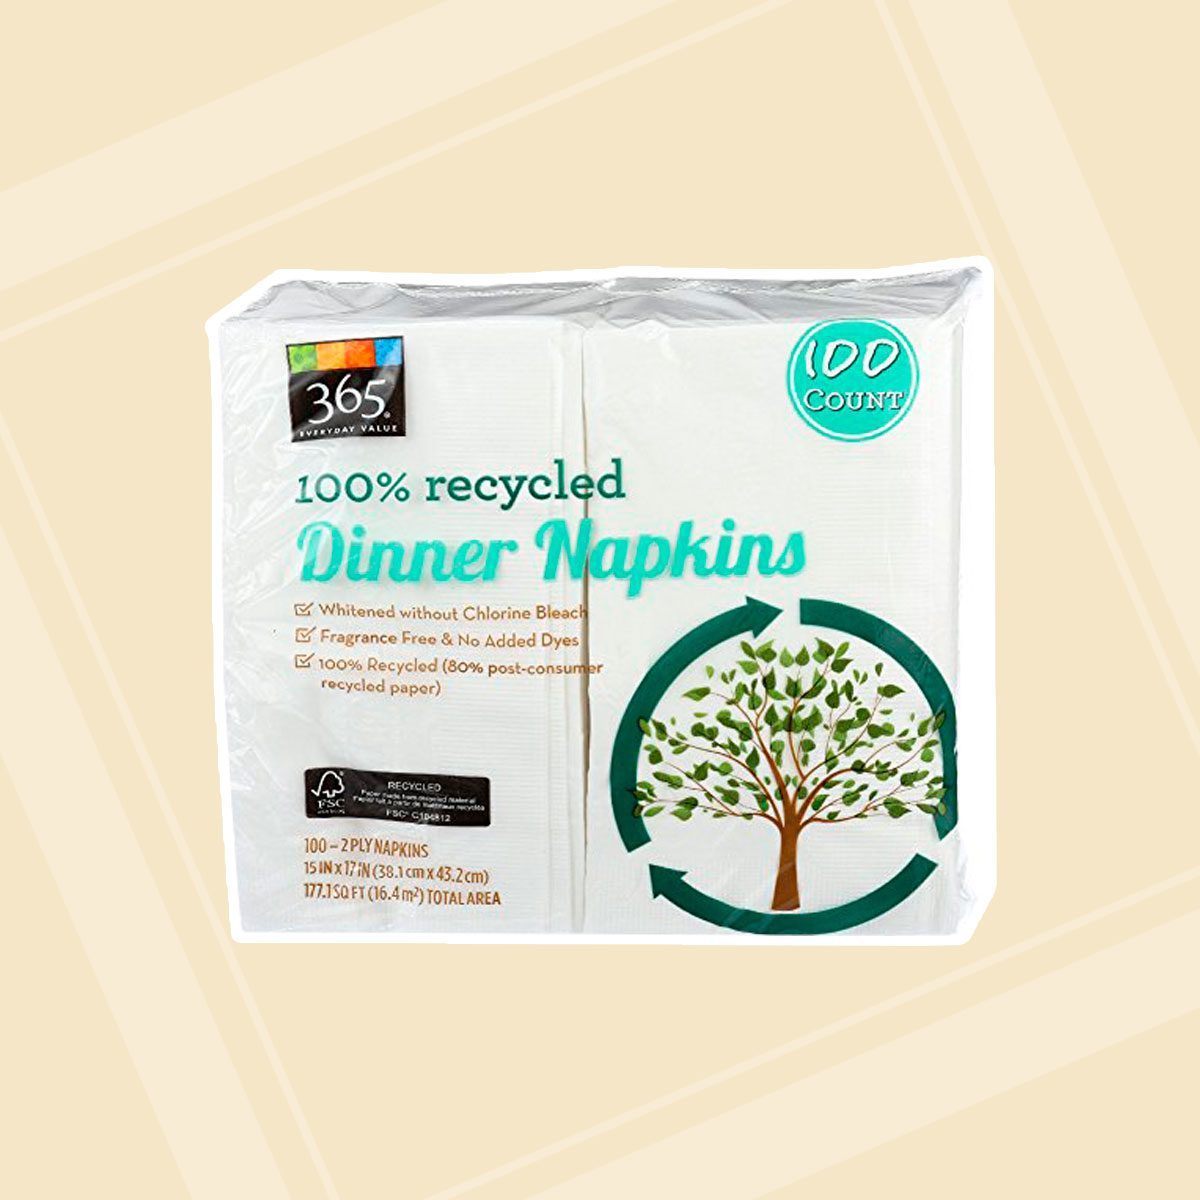 Recycled Dinner Napkins